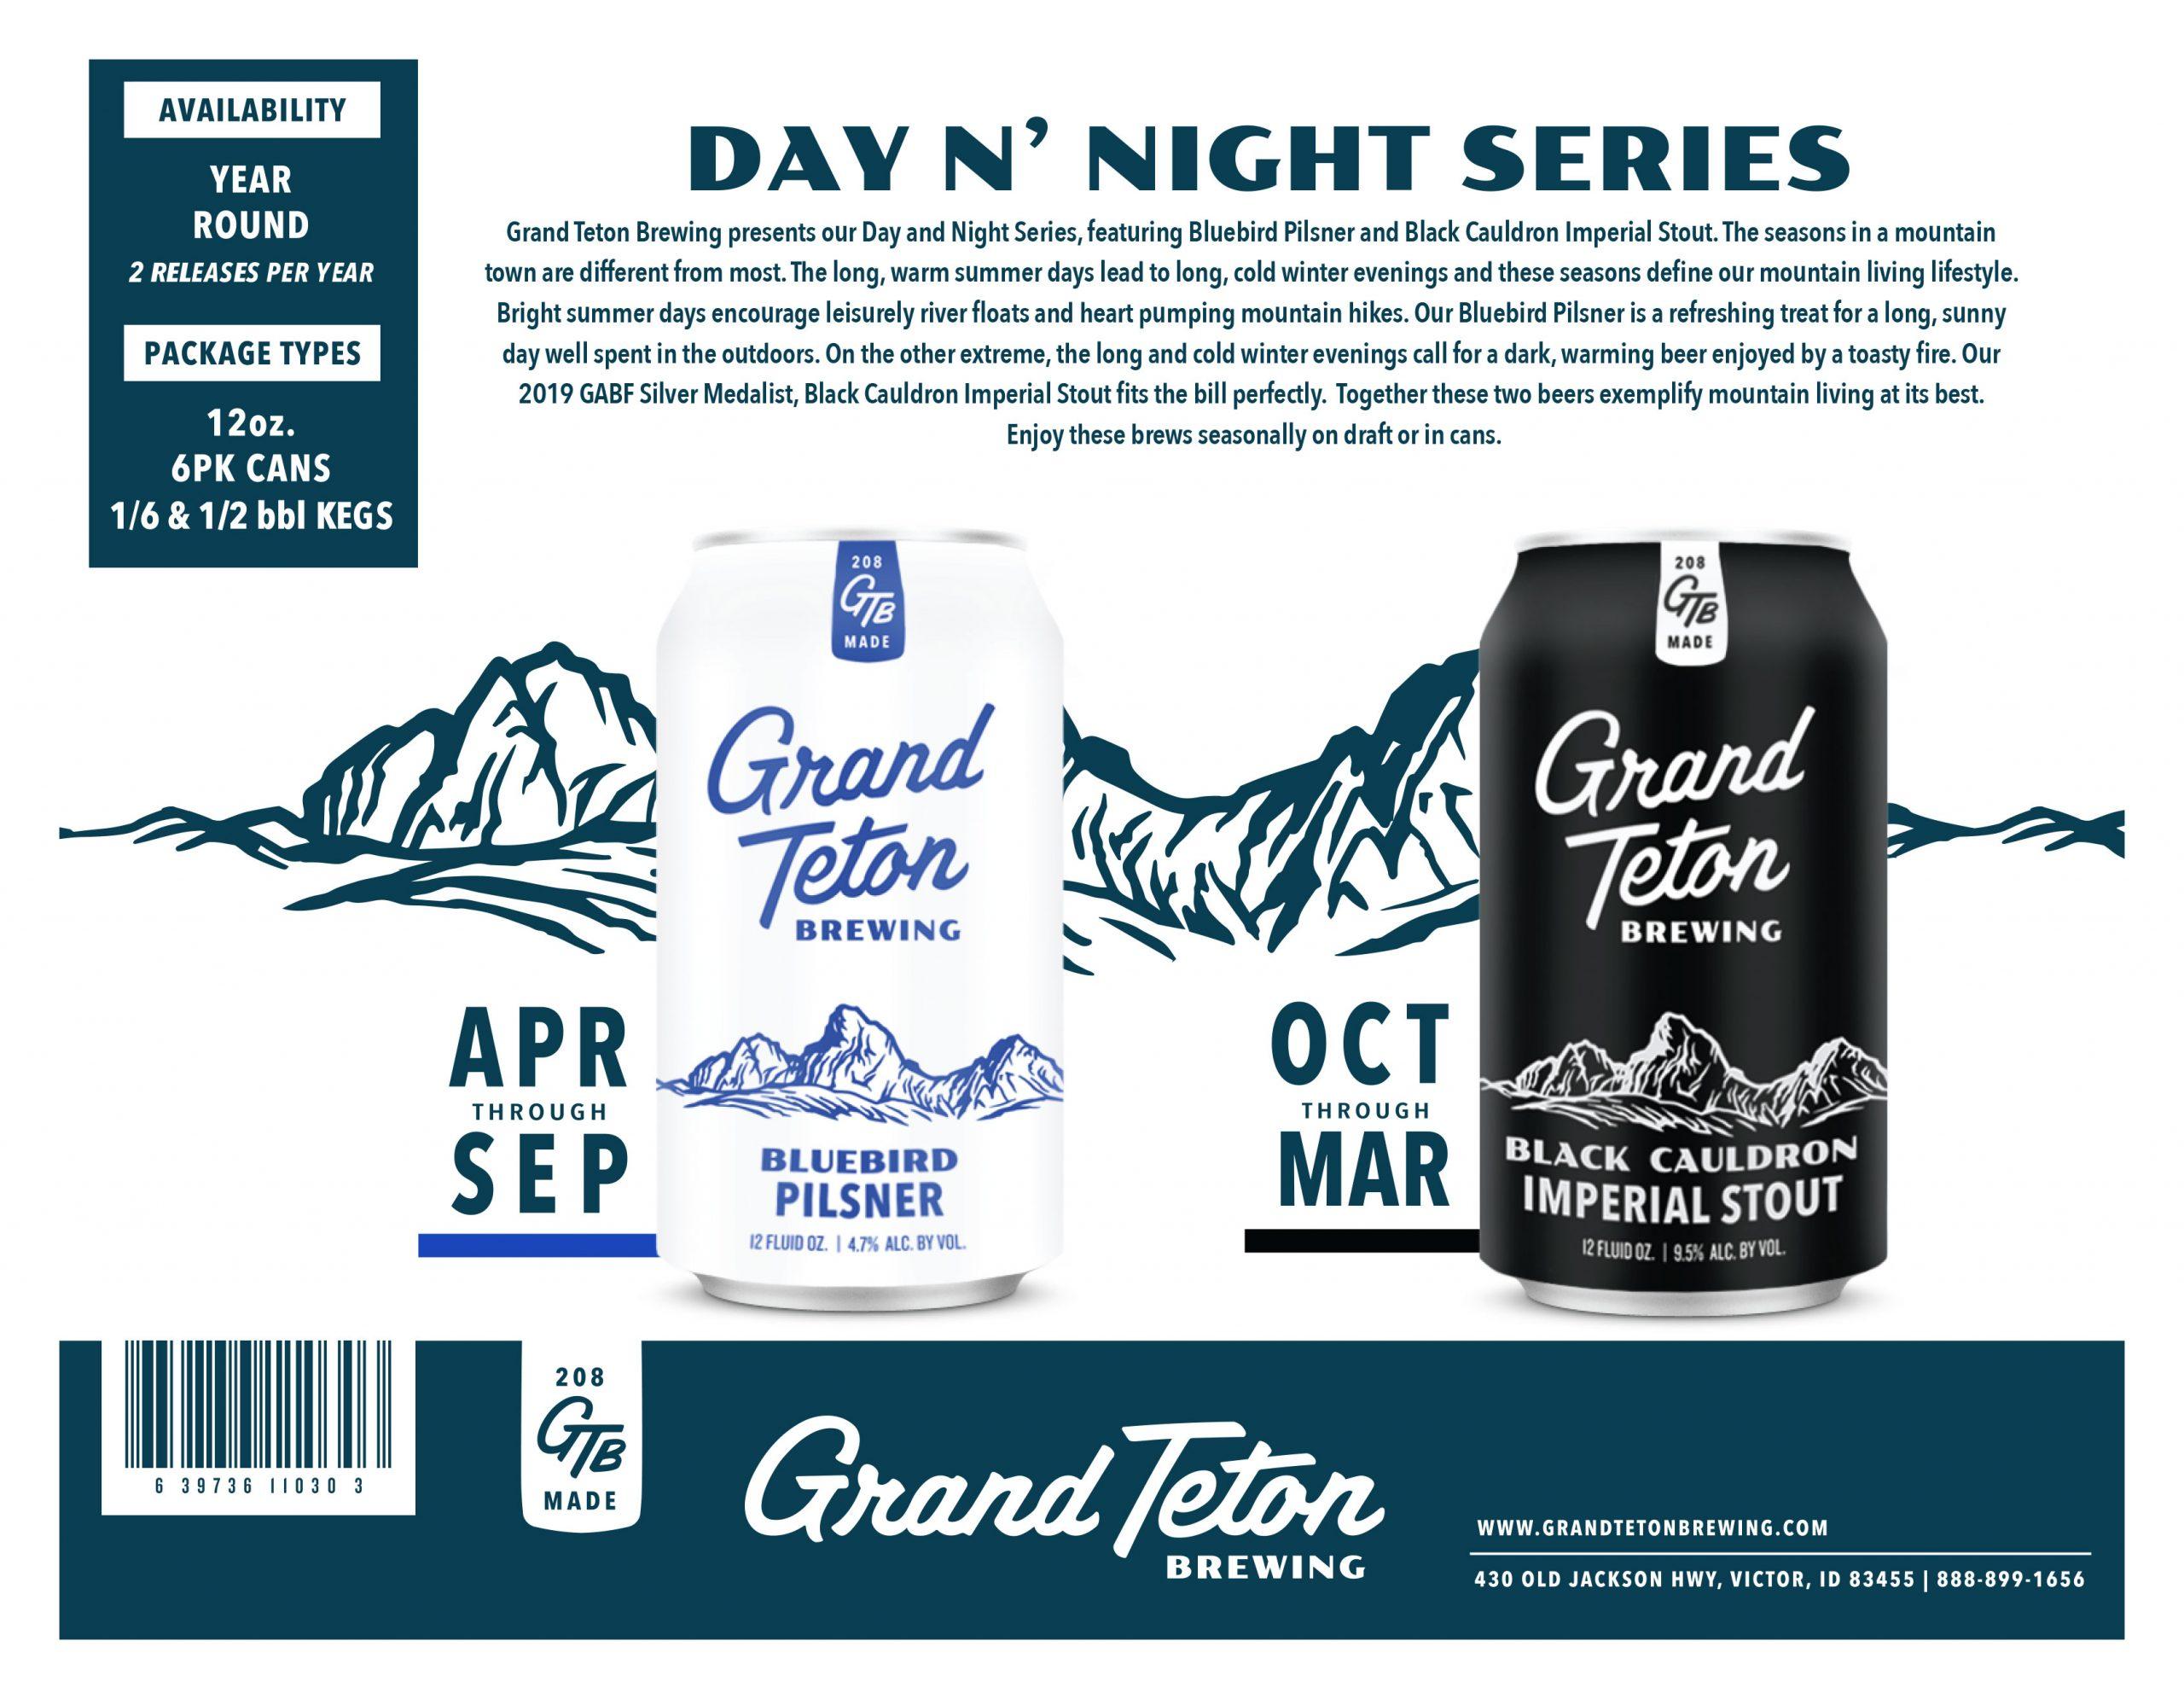 Day N' Night Series